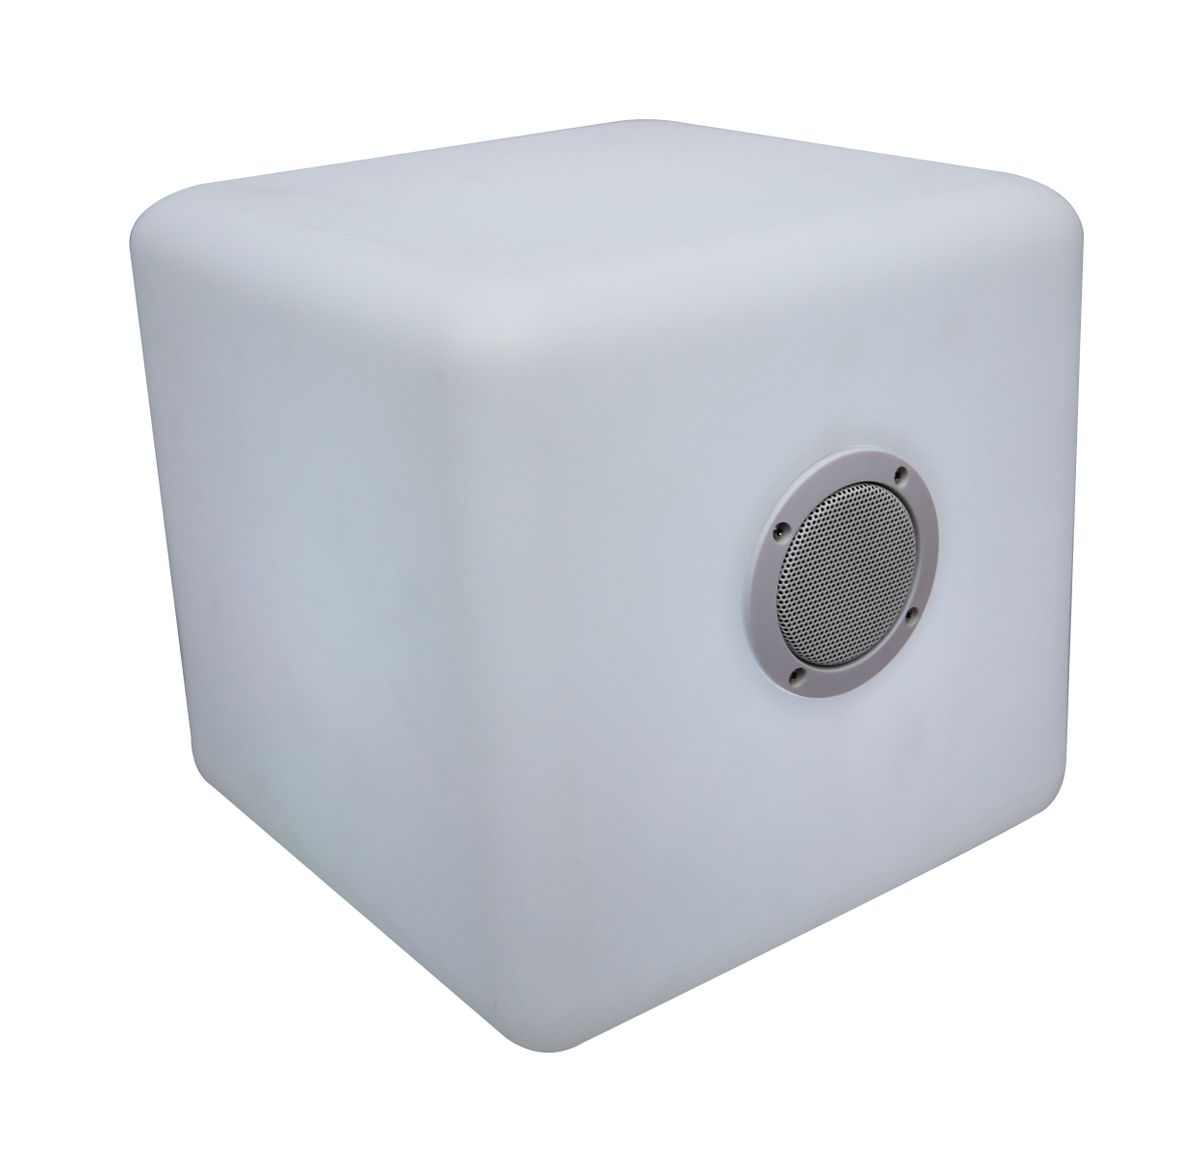 RGB Leuchtwürfel 40cm inkl. Lautsprecher Bari BT1701-40CS – Bild 2